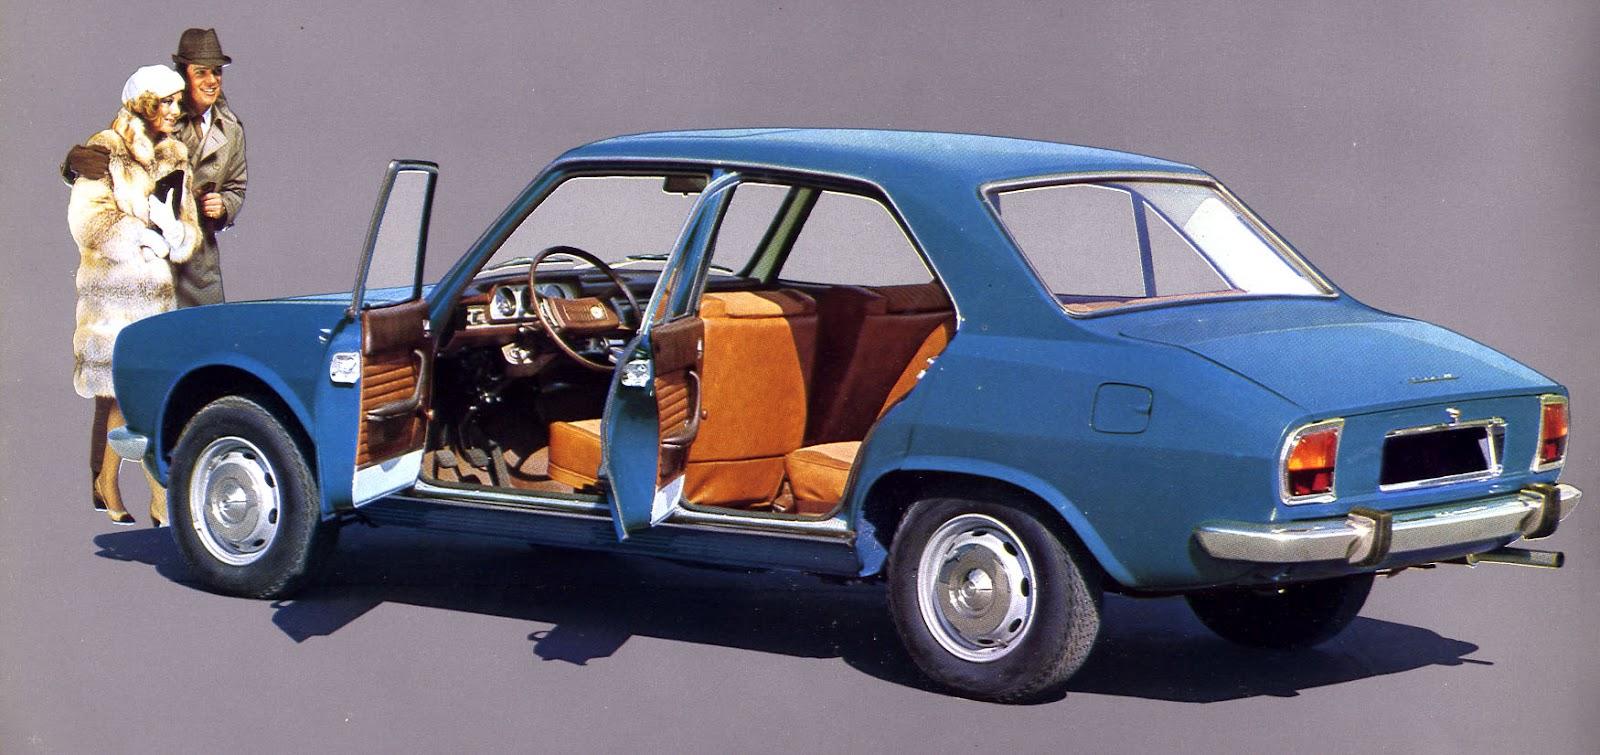 peugeot 504 related images start 400 weili automotive network. Black Bedroom Furniture Sets. Home Design Ideas